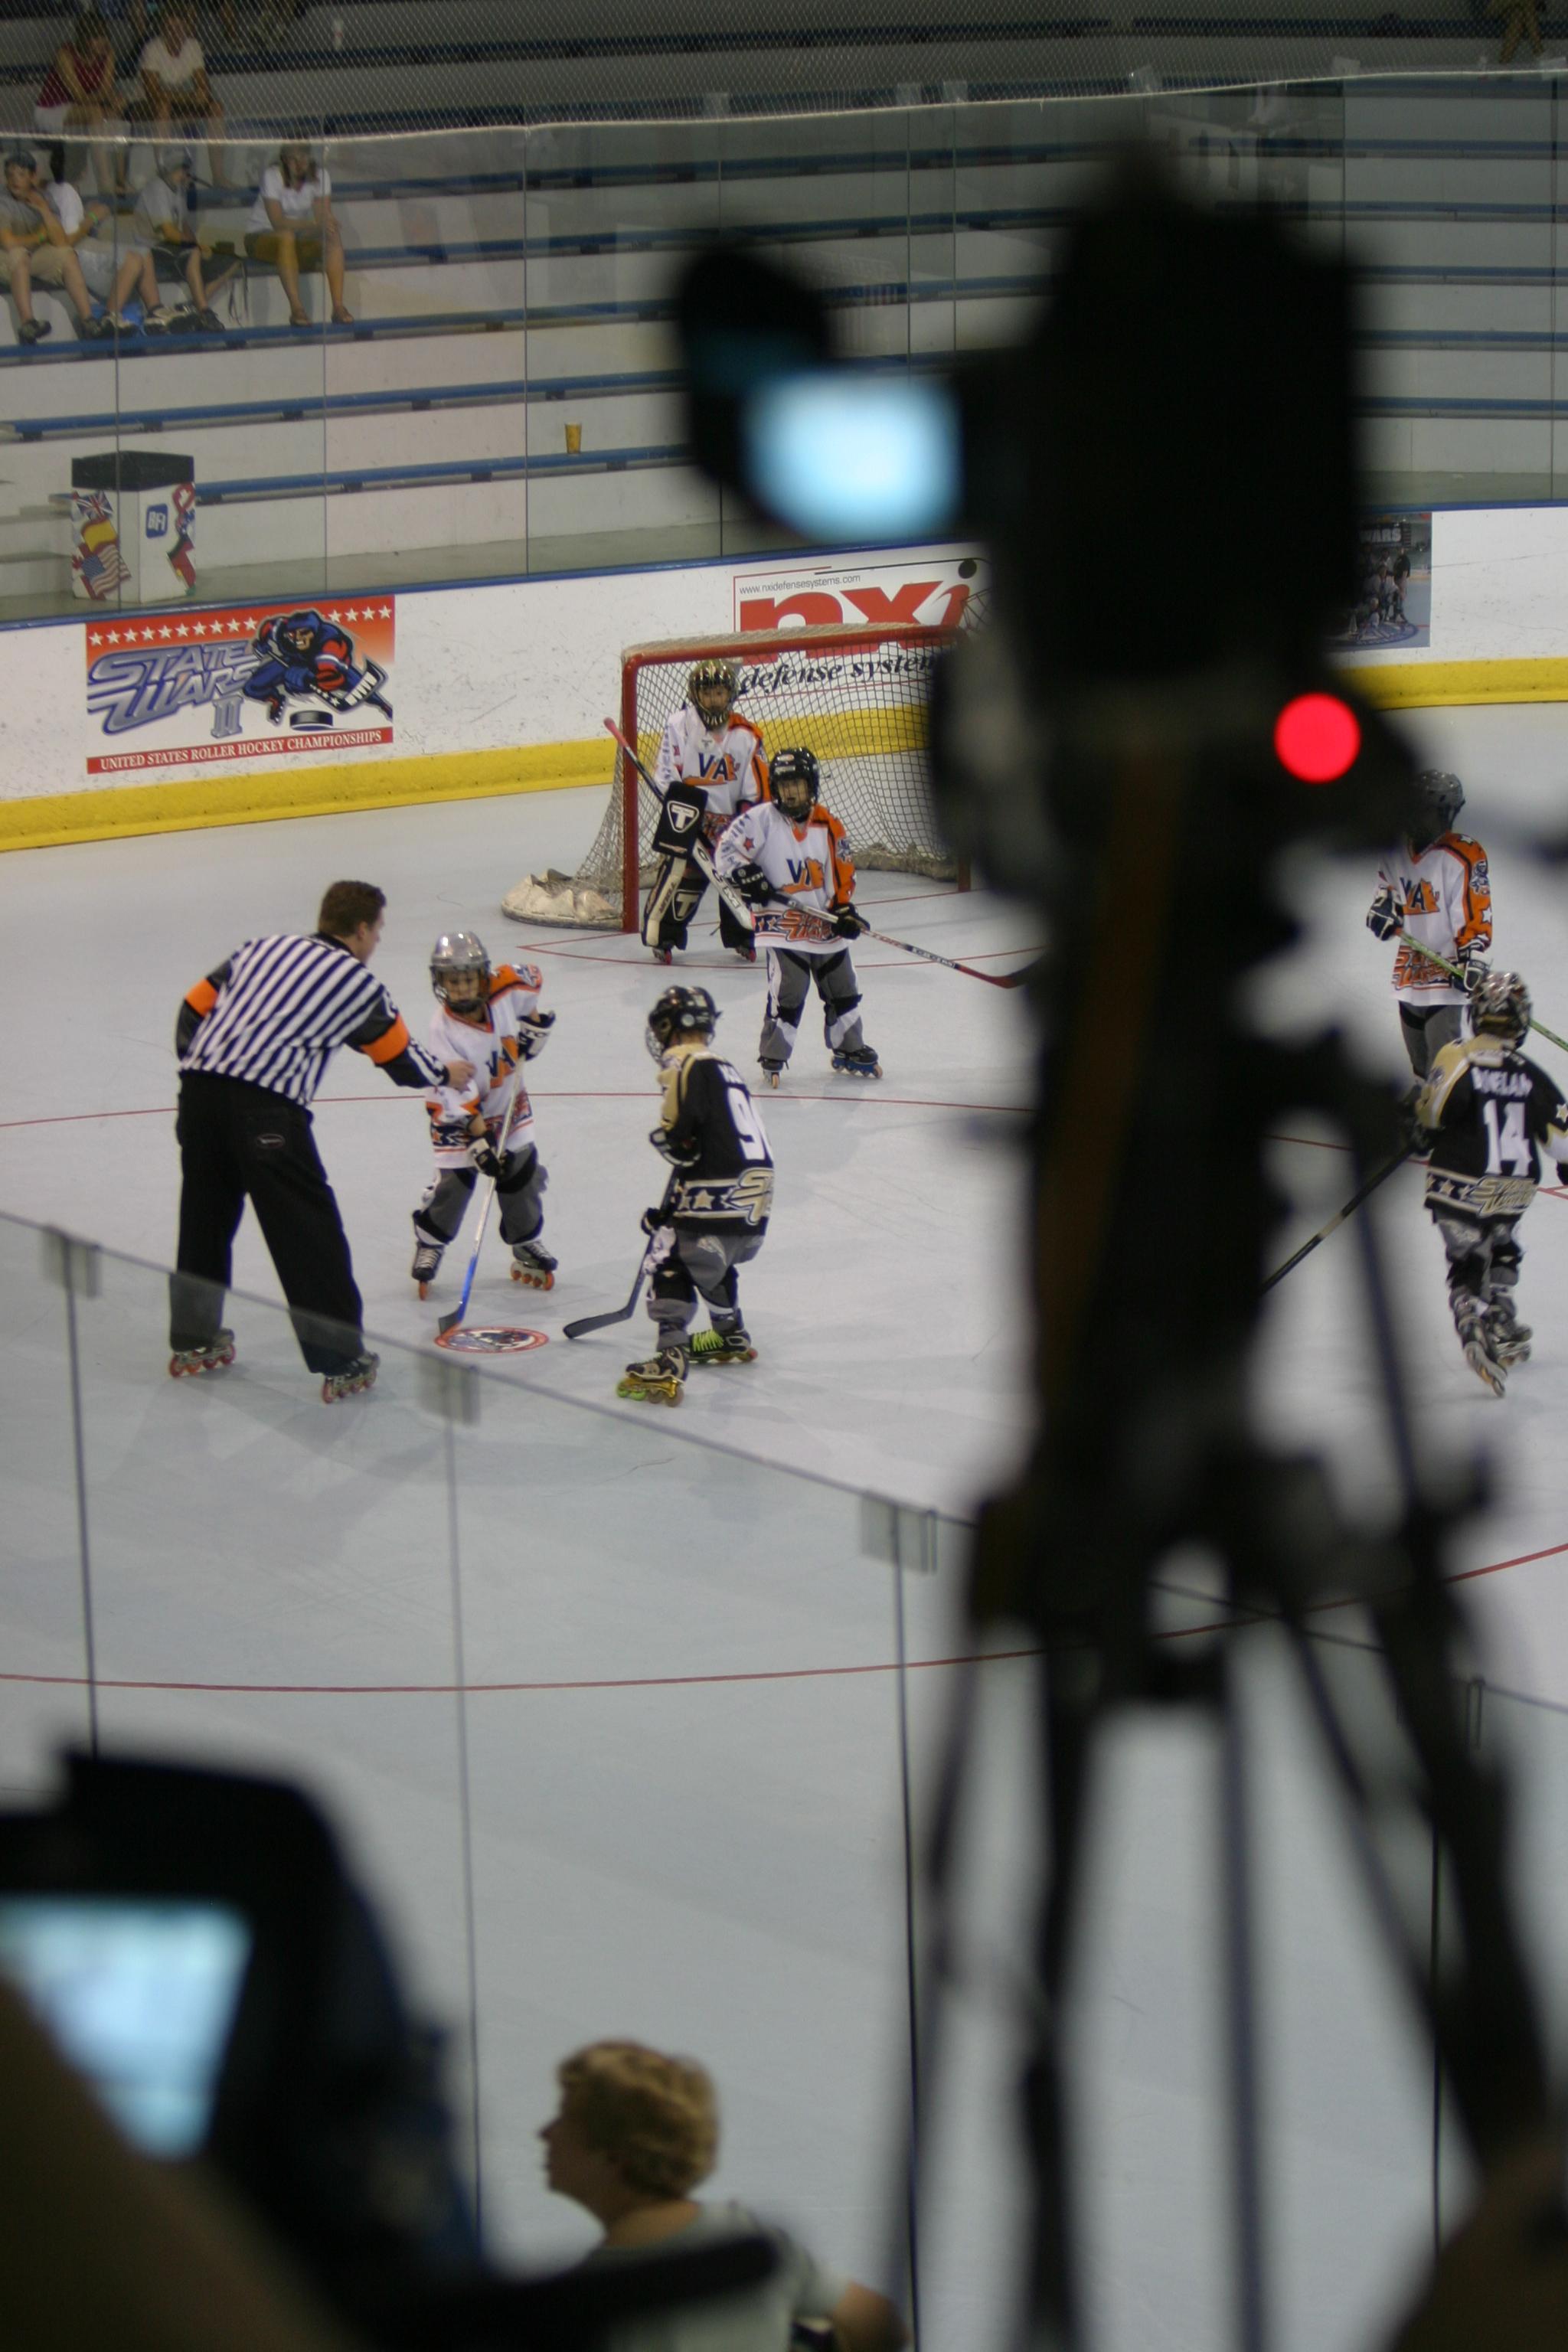 State Wars National Championship: Lifetime Media shot 900 games in 13 days